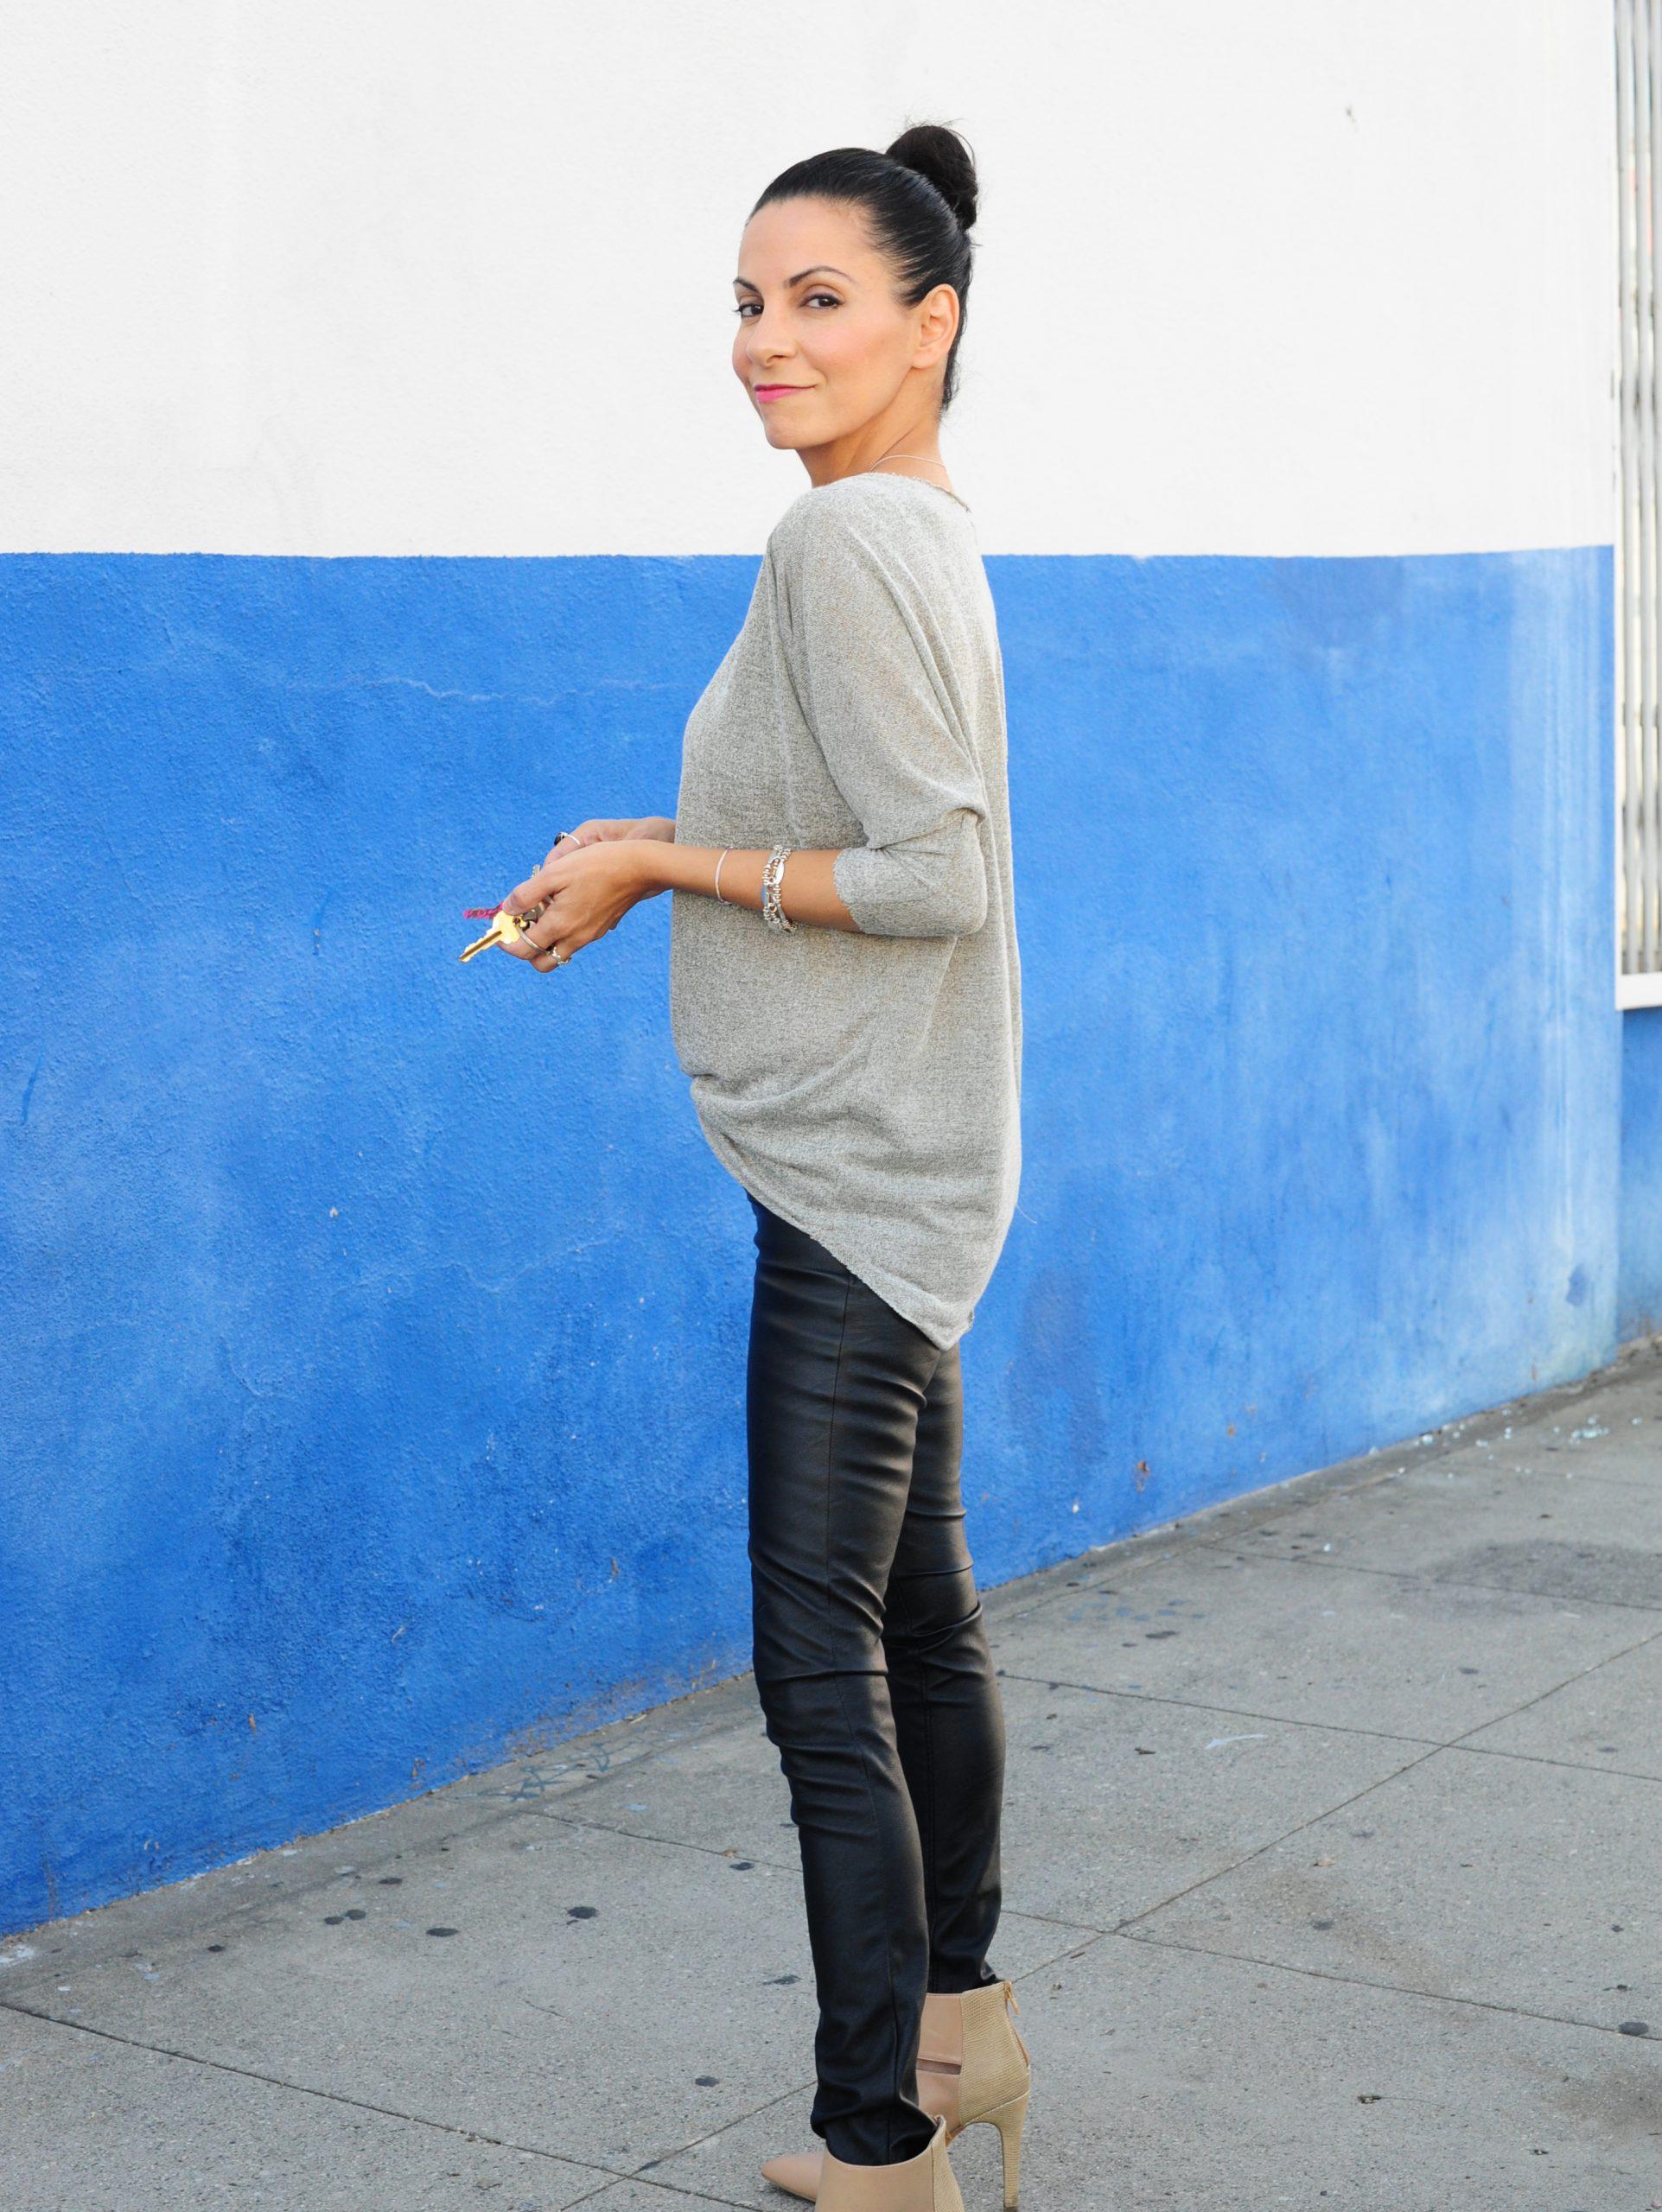 Daily Outfits - Project Social T - Blank Denim - Sole Society Wynn Heels